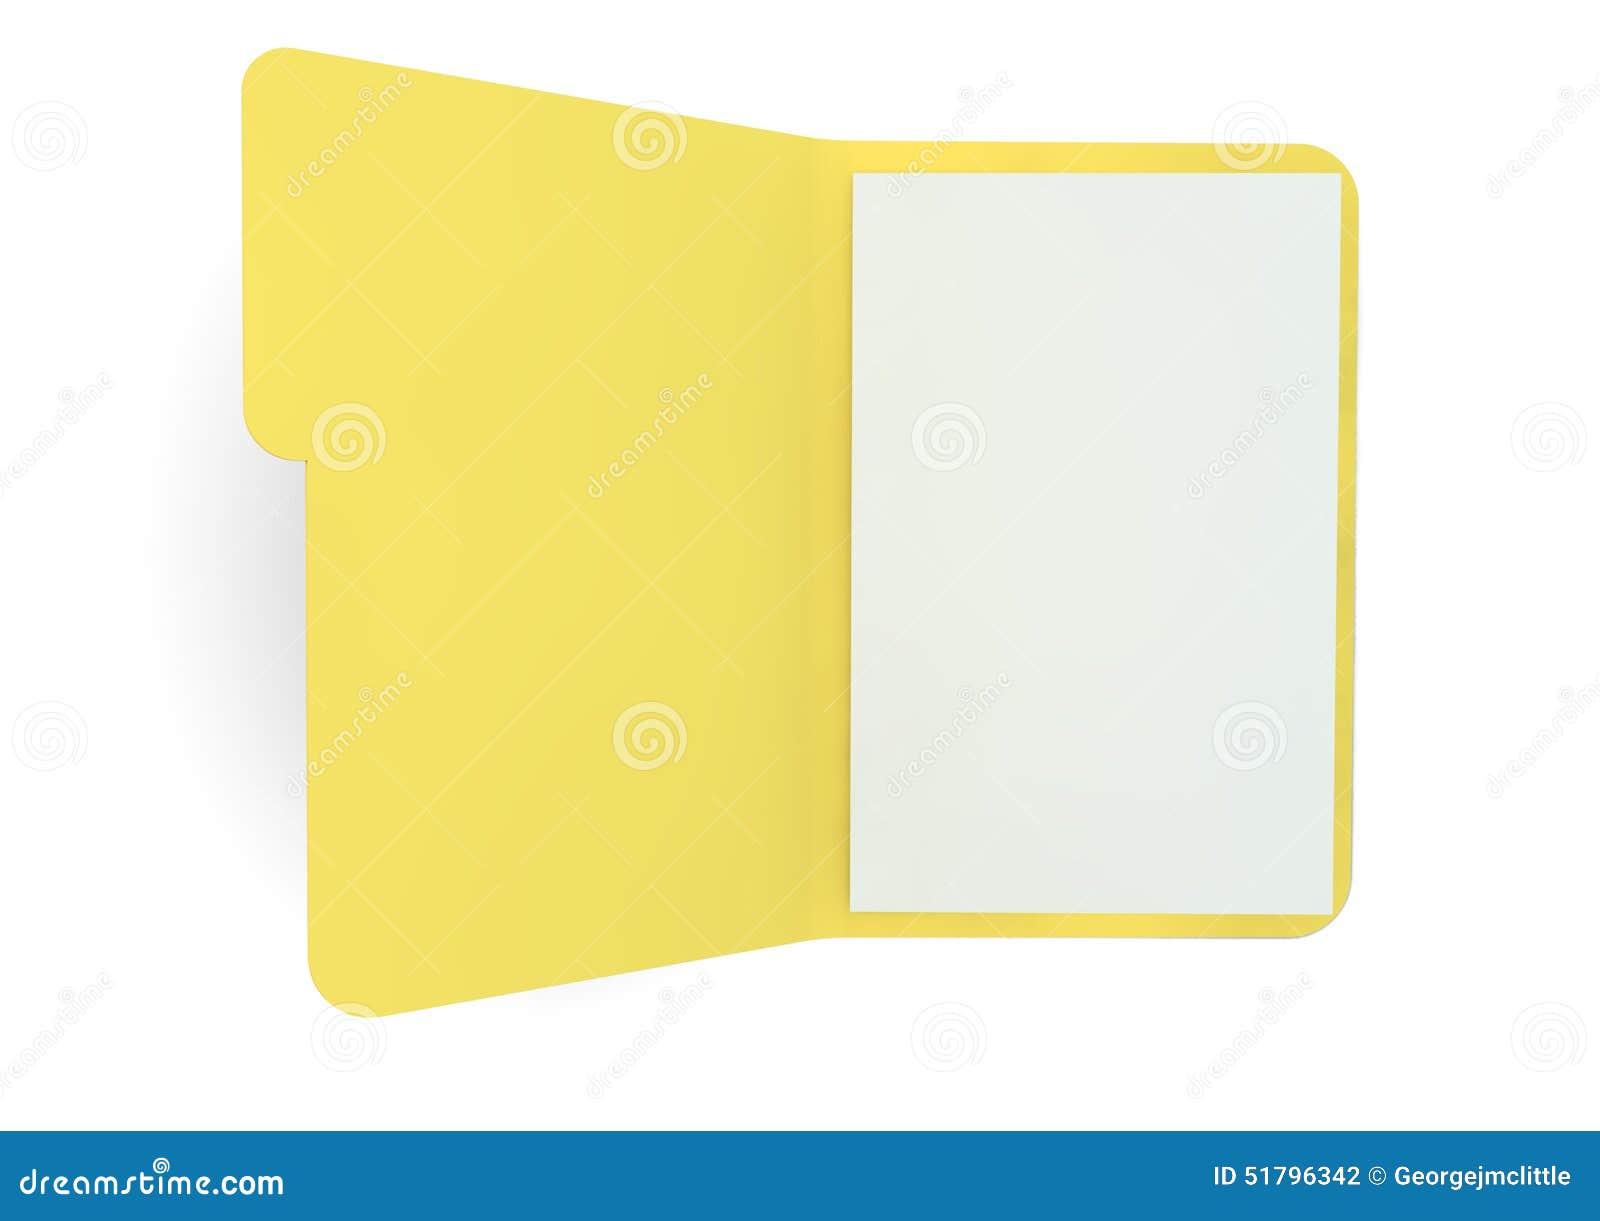 how to open rar folder